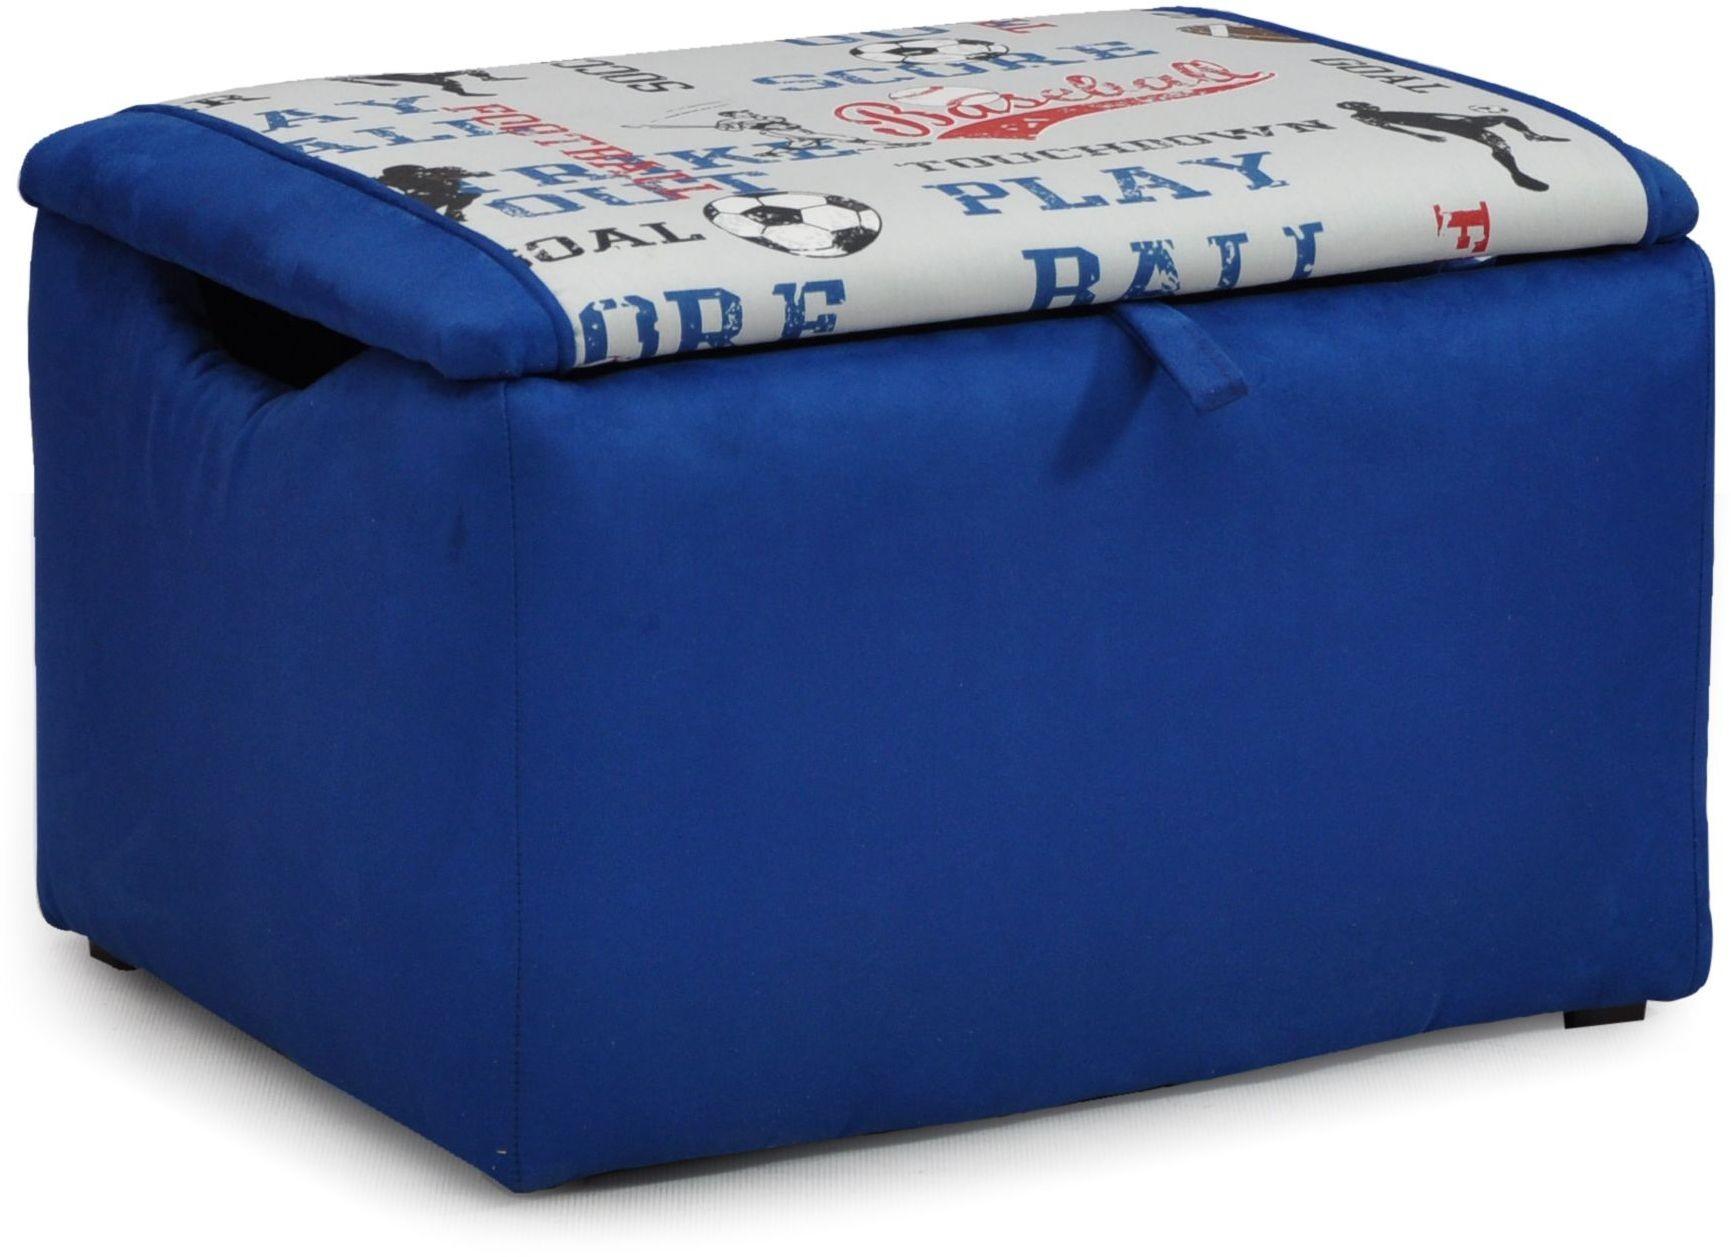 Mixy Sports Blue Suede Upholstered Storage Bench 1400 1 Sports Bs Kidz World